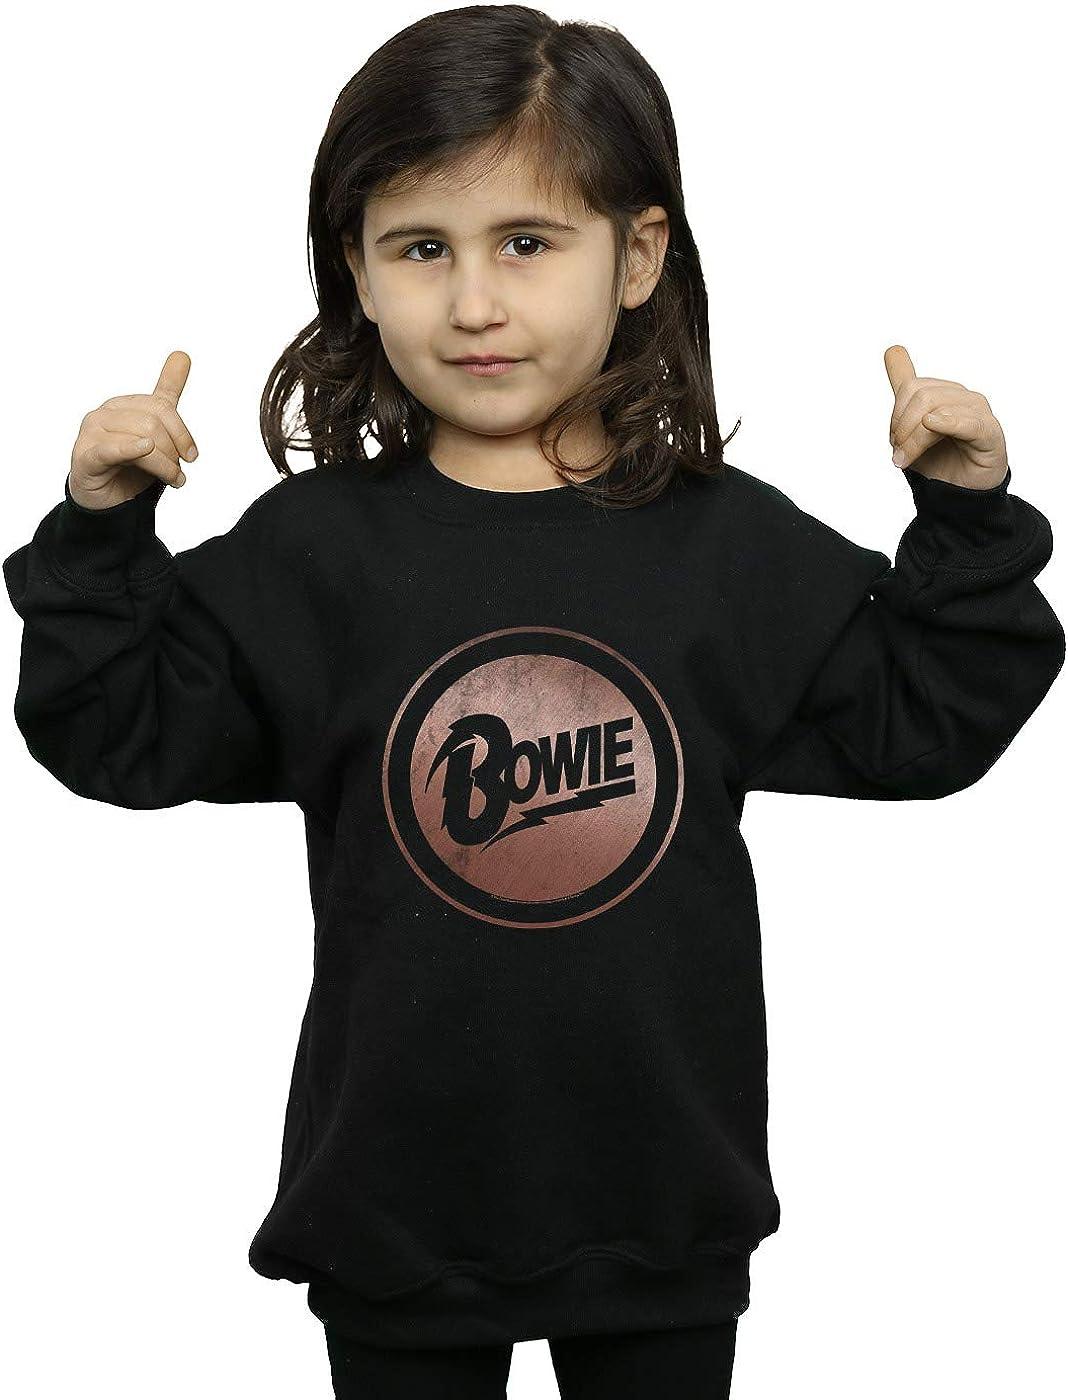 ABSOLUTECULT David Bowie Girls Rose Gold Circle Sweatshirt